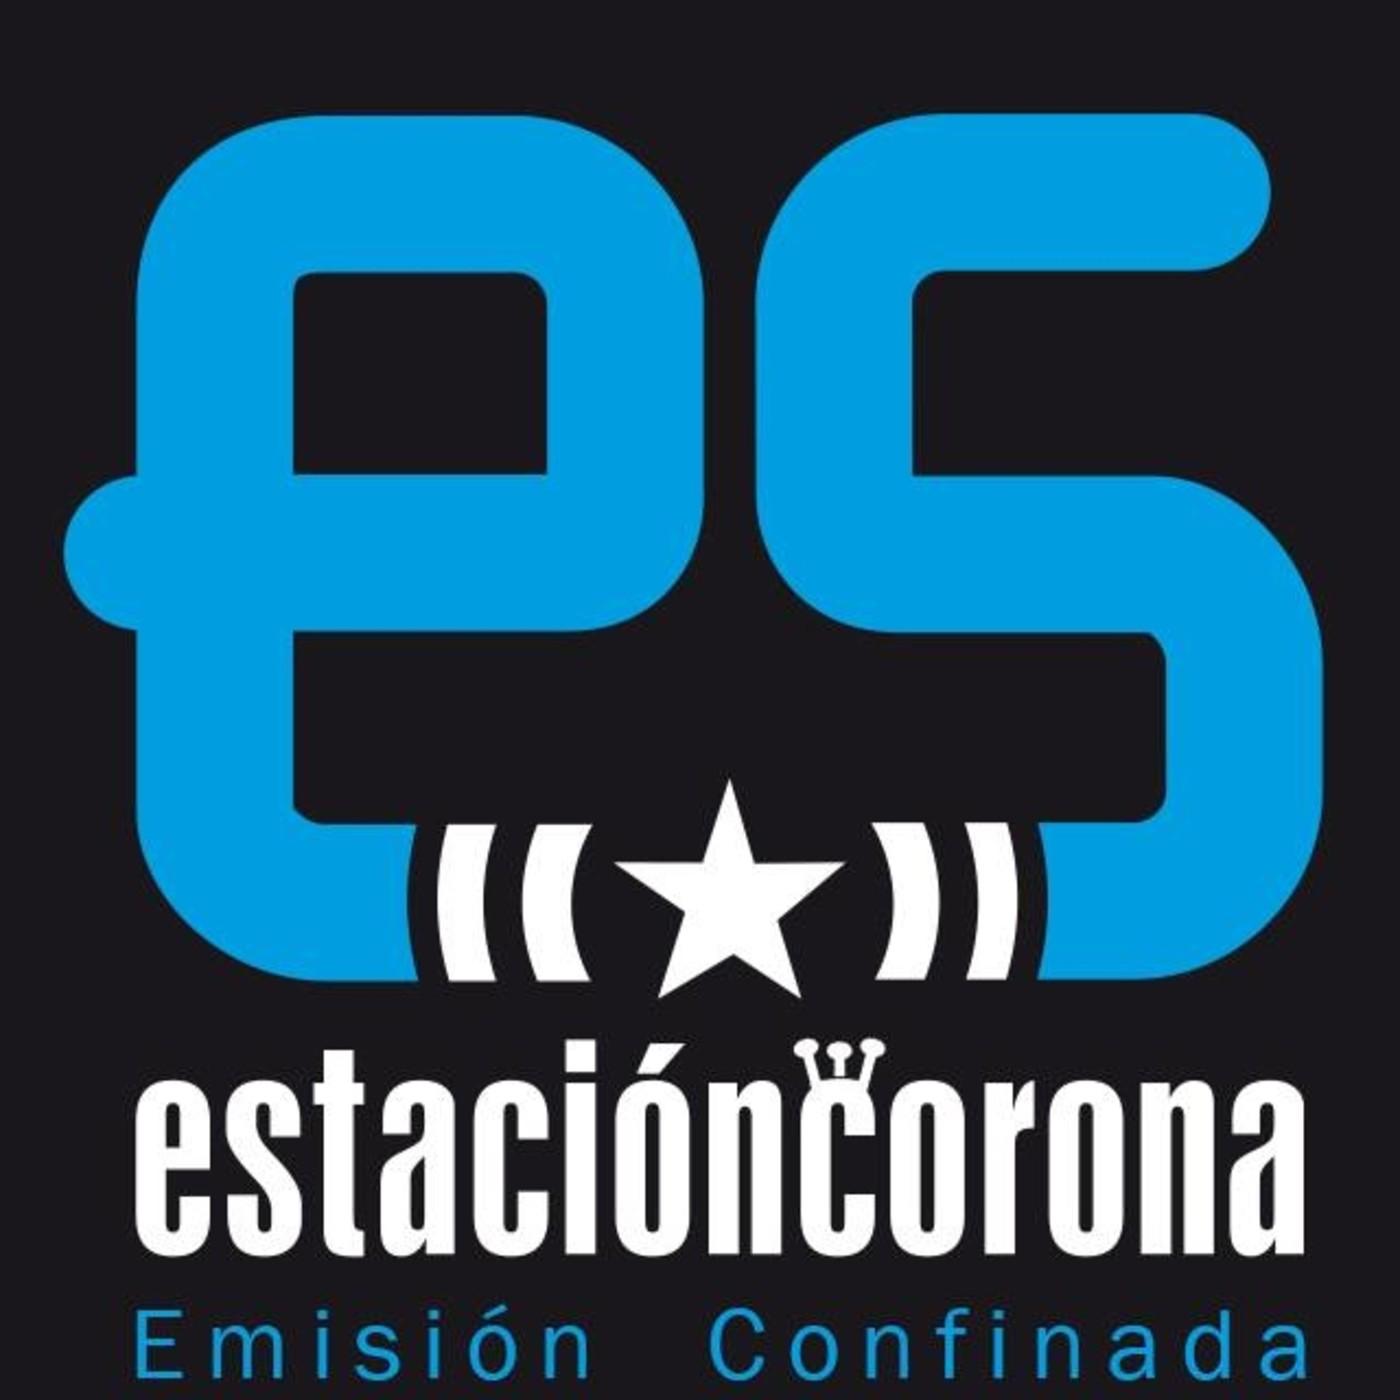 Estación Corona Vol. 3